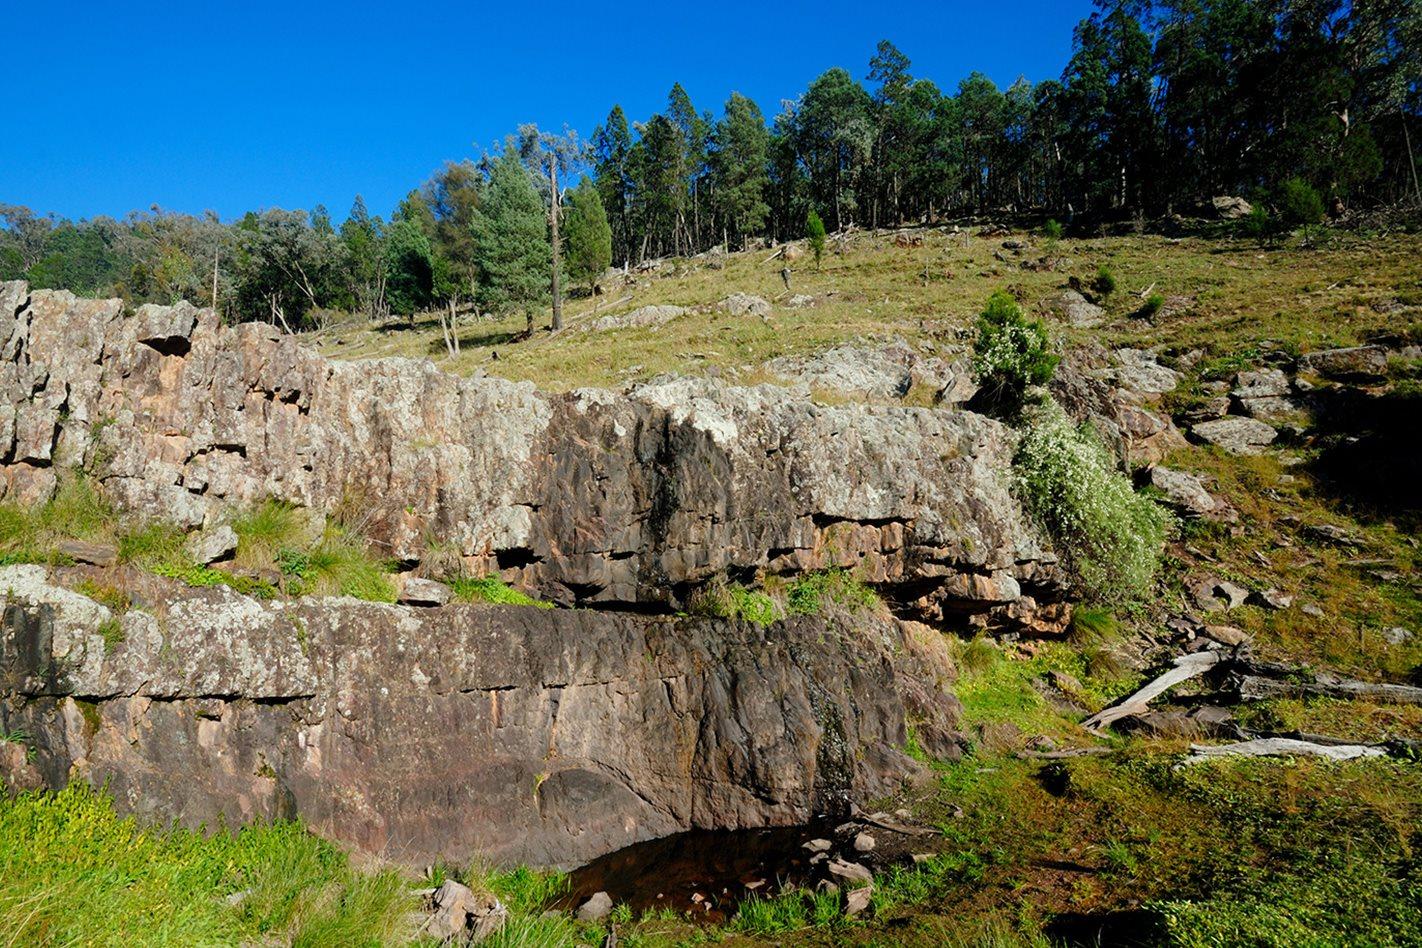 Dripping-rock-Nangar-National-Park,-NSW.jpg